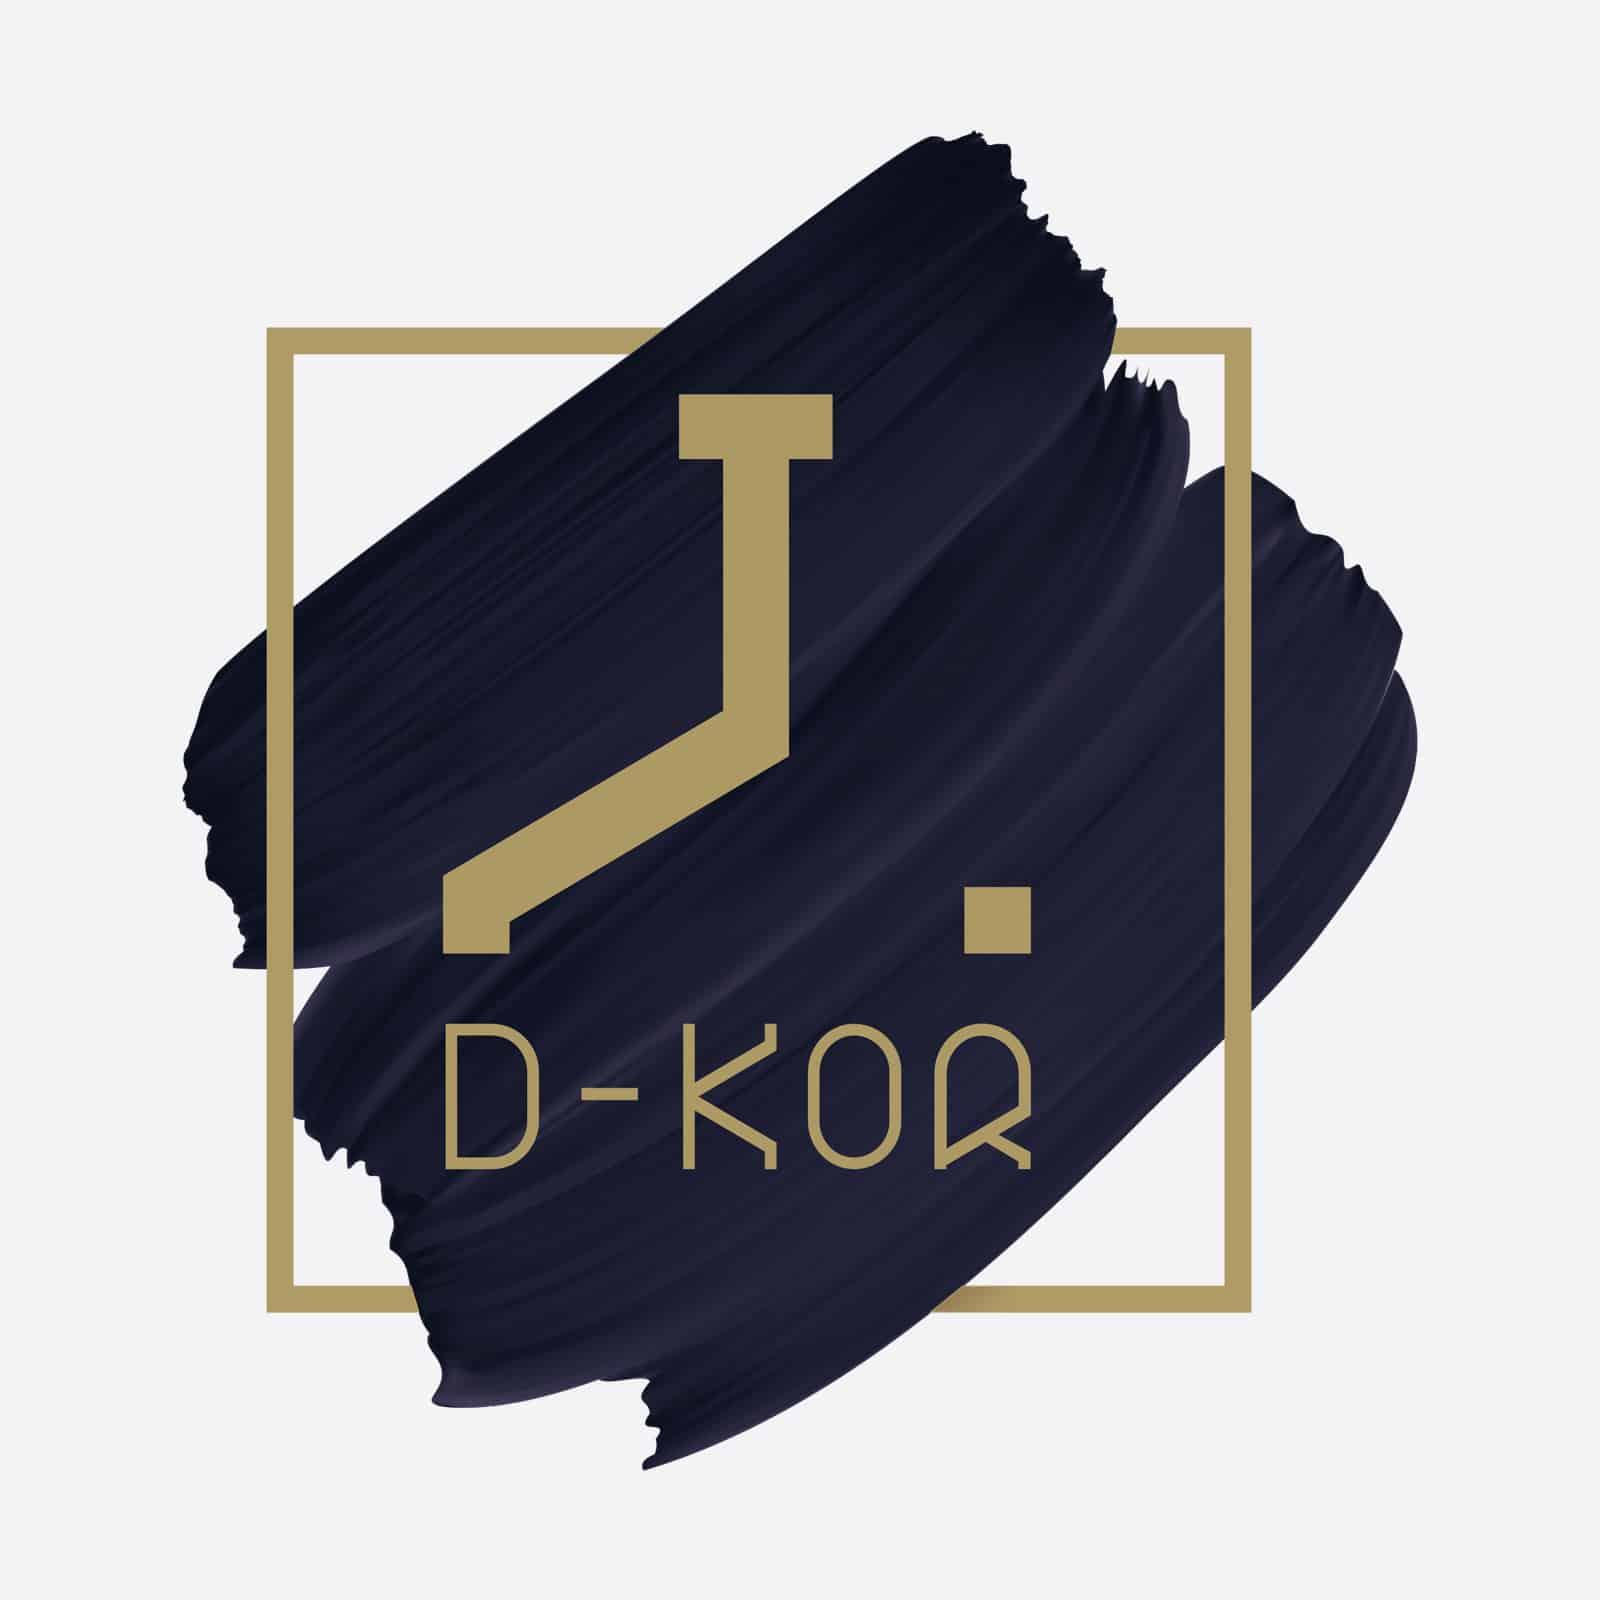 logo_J.D-kor